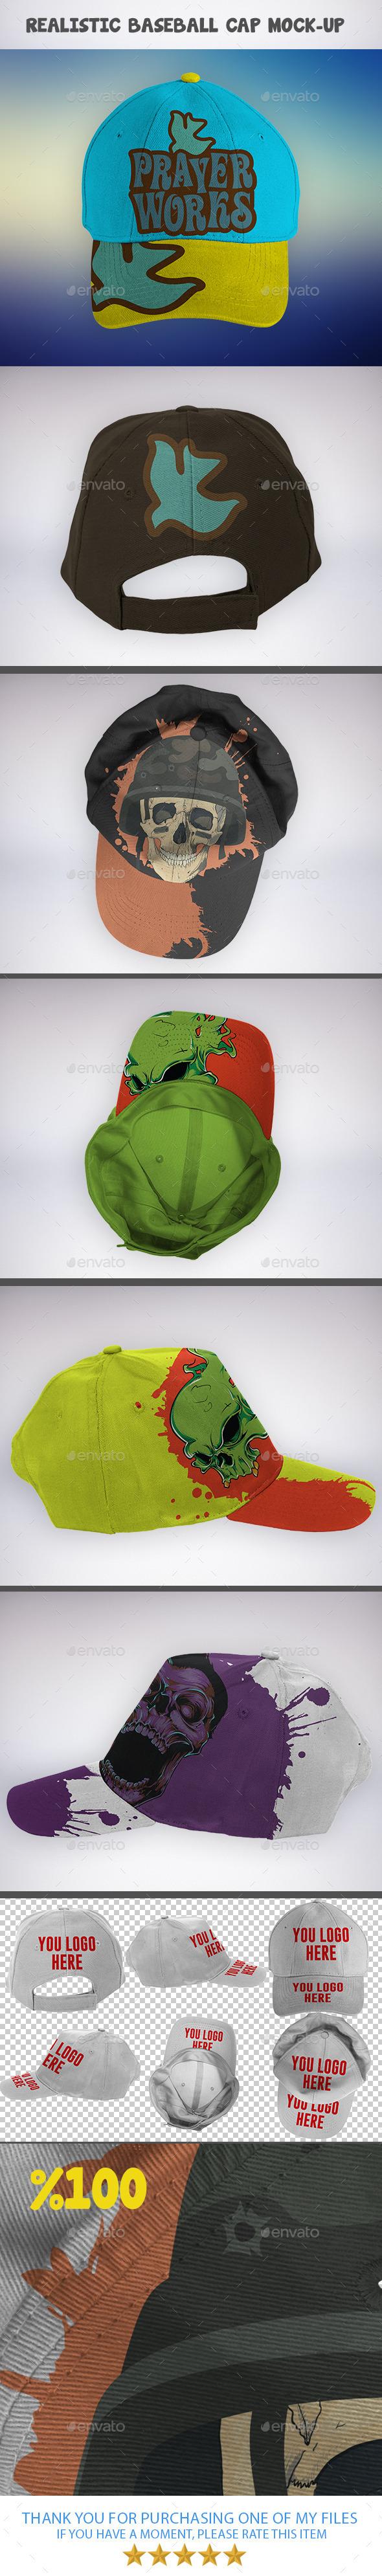 GraphicRiver Realistic Baseball Cap Mock-Ups 9294175